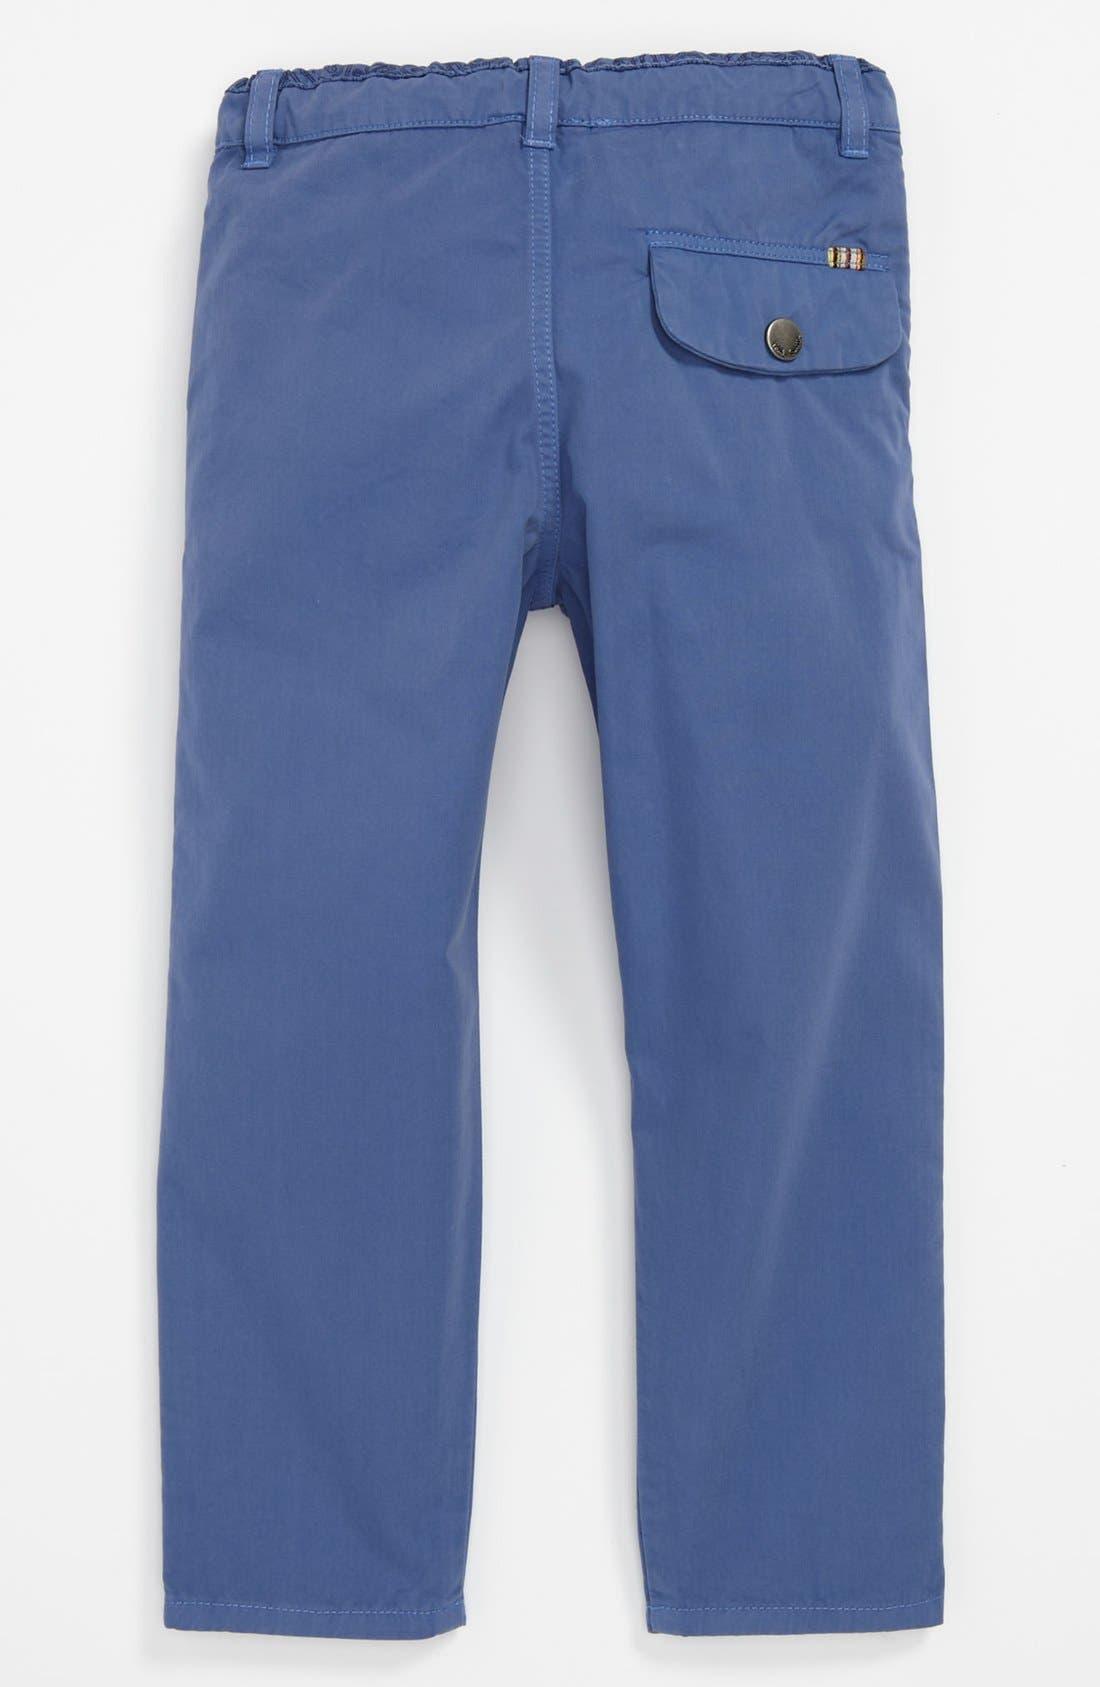 Main Image - Paul Smith Junior Denim Pants (Baby)